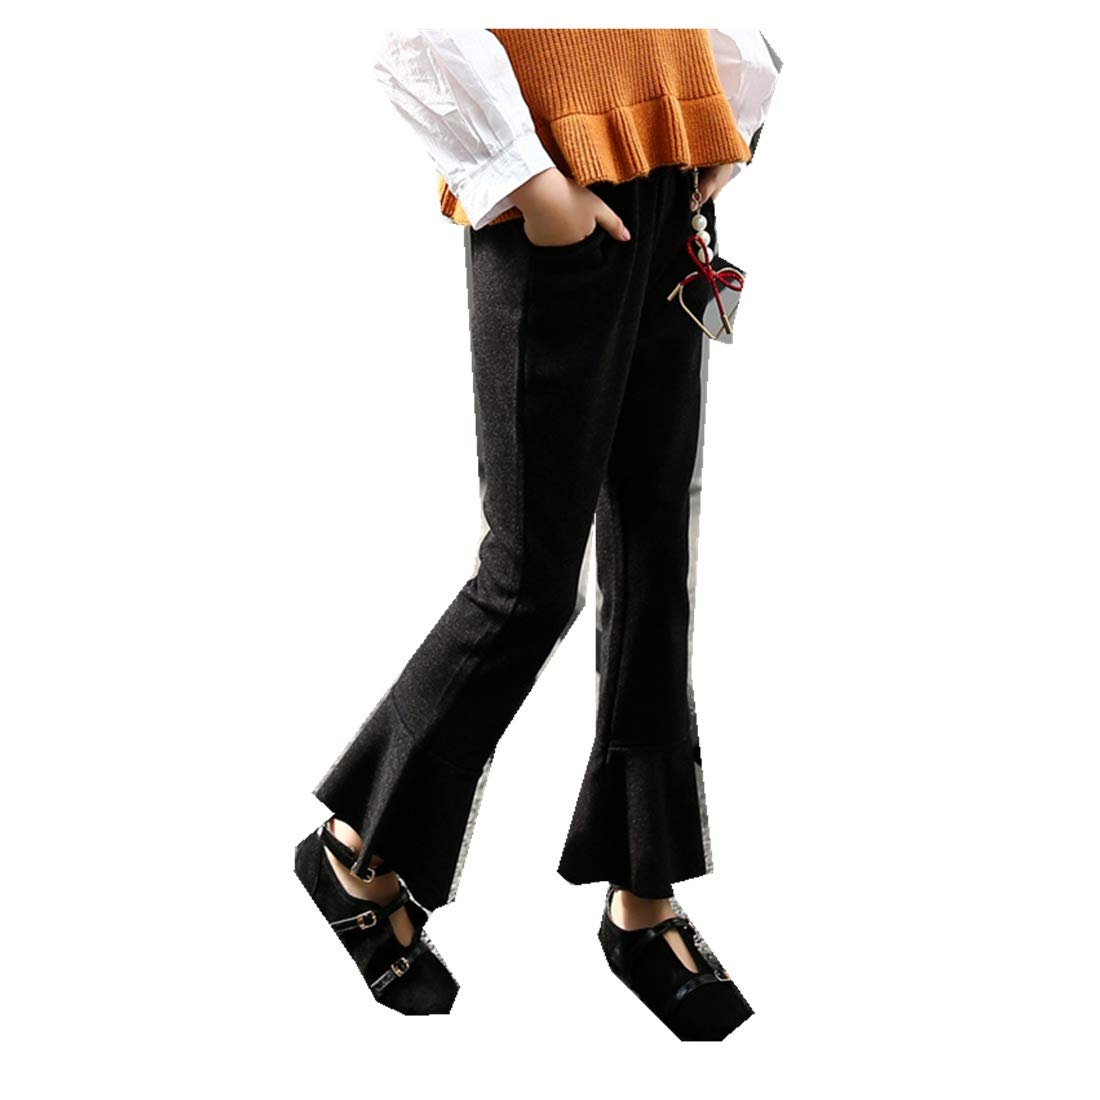 Autumn New Girls Korean Bell Mouth Pants Stripes West Body Pants Elastic Belt